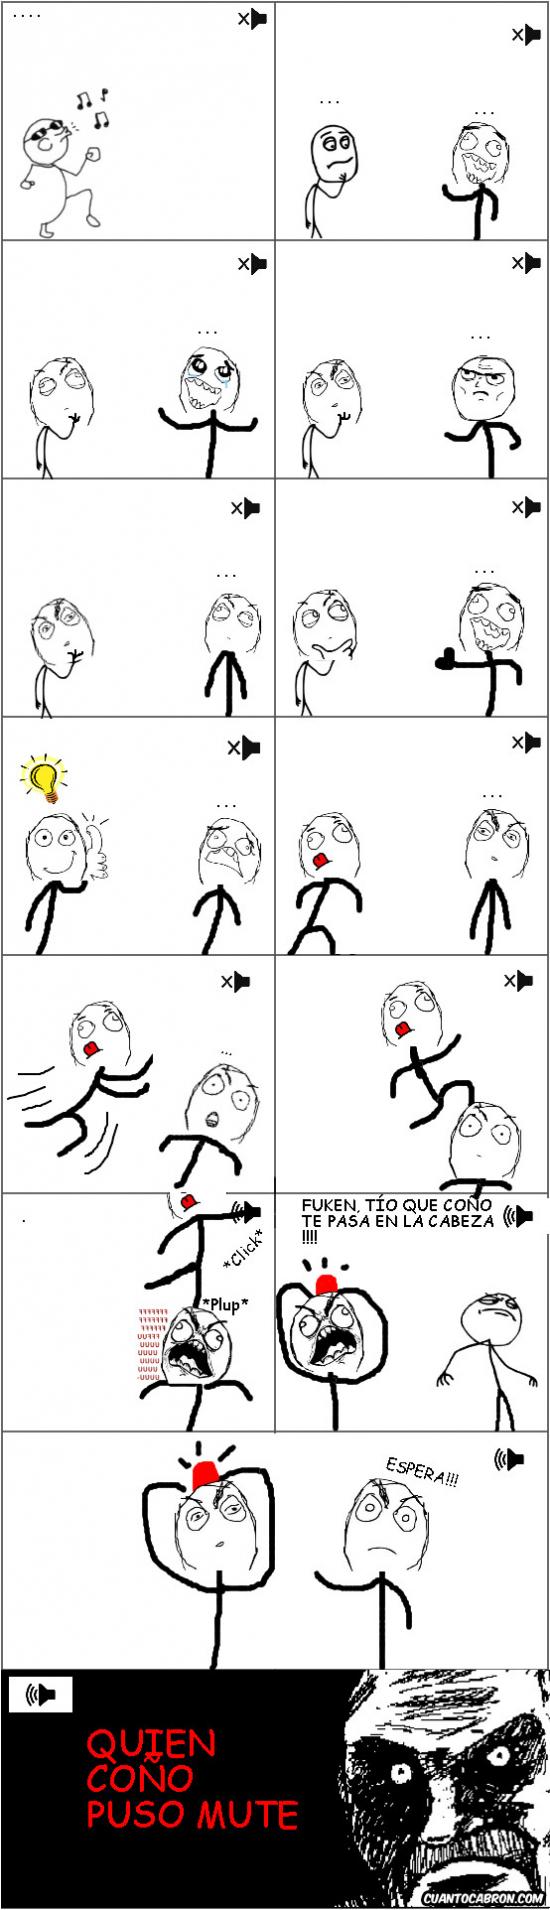 True_story - Maldito Mute...